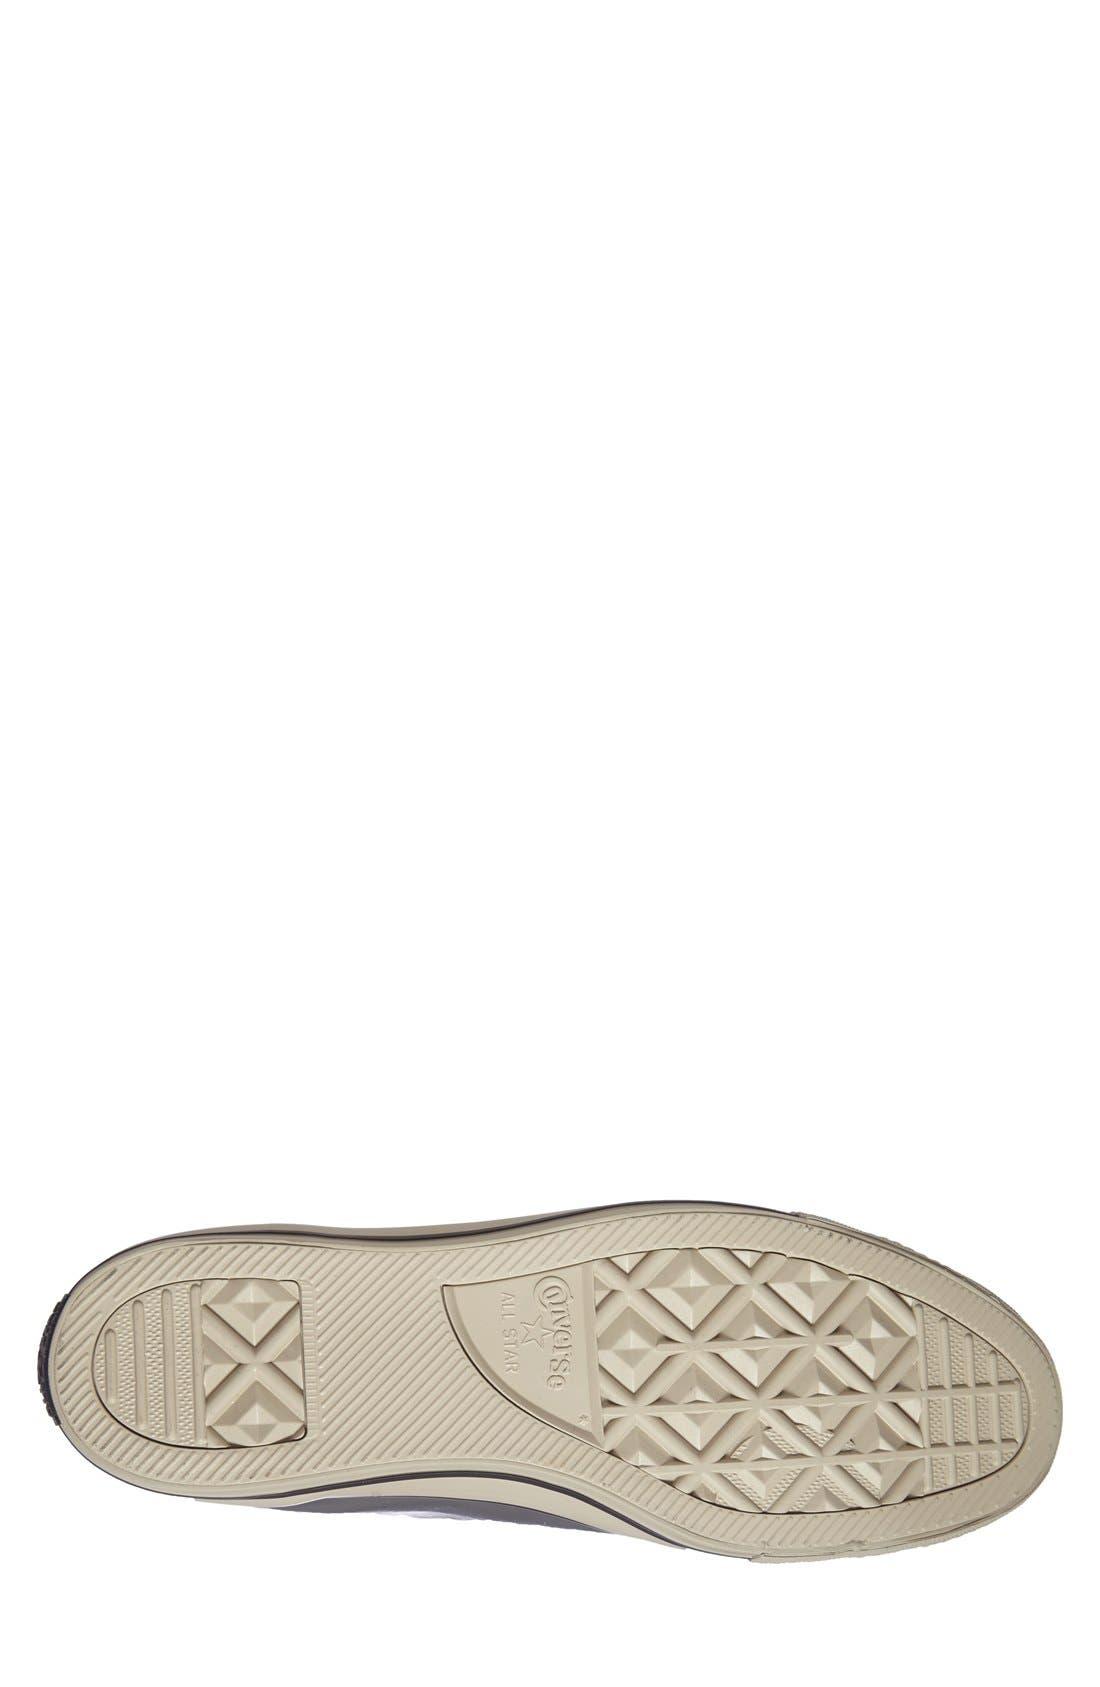 Alternate Image 4  - Converse Chuck Taylor® All Star® Rubber High Top Sneaker (Men)